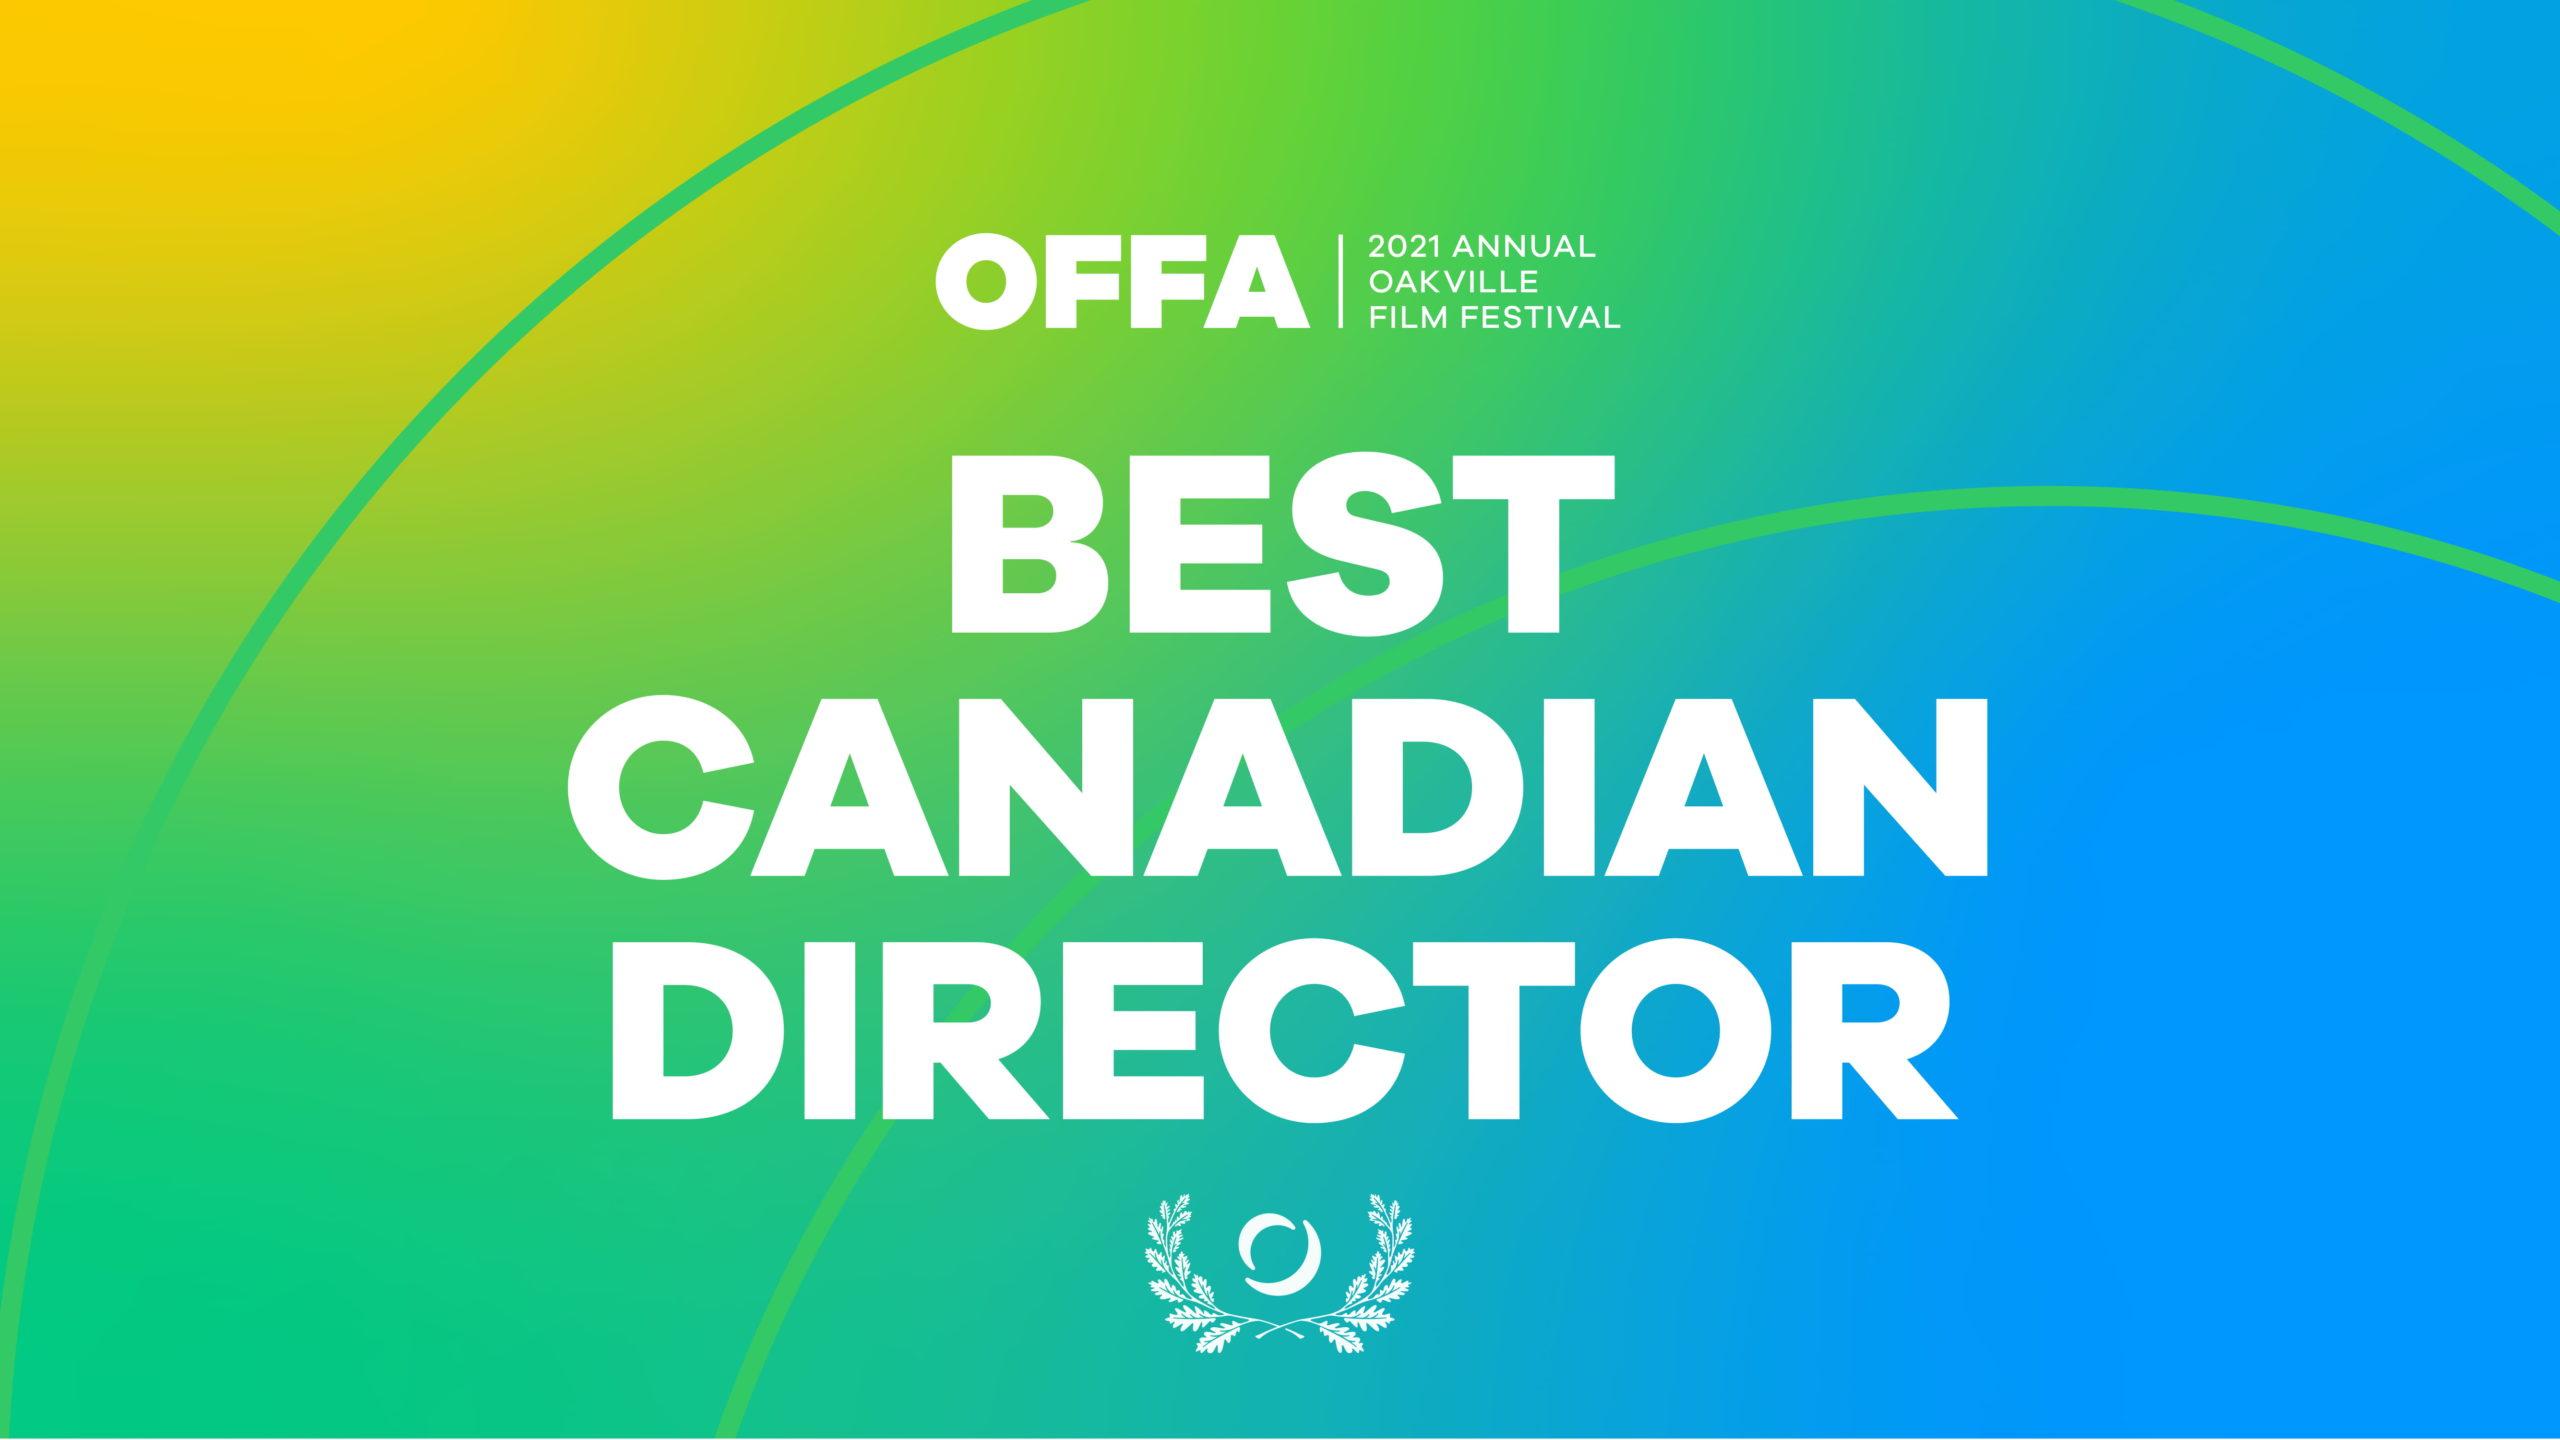 OFFA 2021 Best Canadian Director